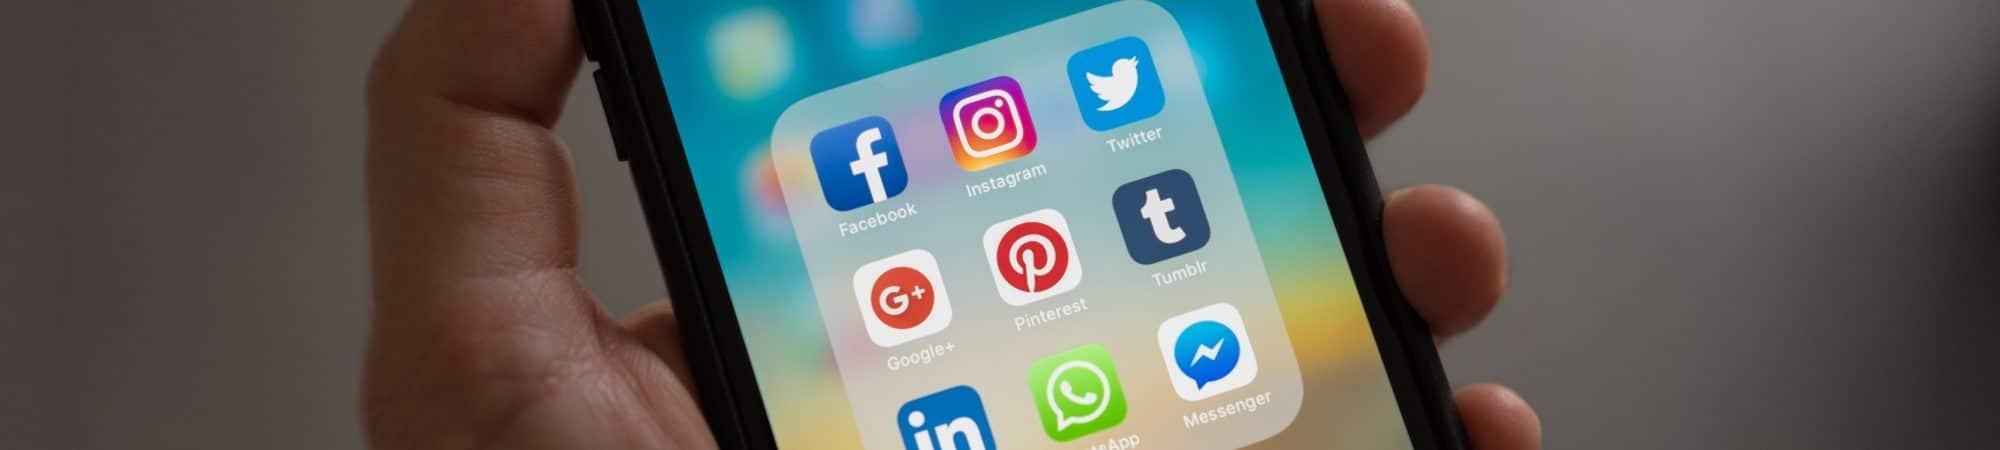 #EuMeCuido: Facebook, YouTube, Twitter e outras redes se unem para ressaltar importância das medidas contra Covid-19